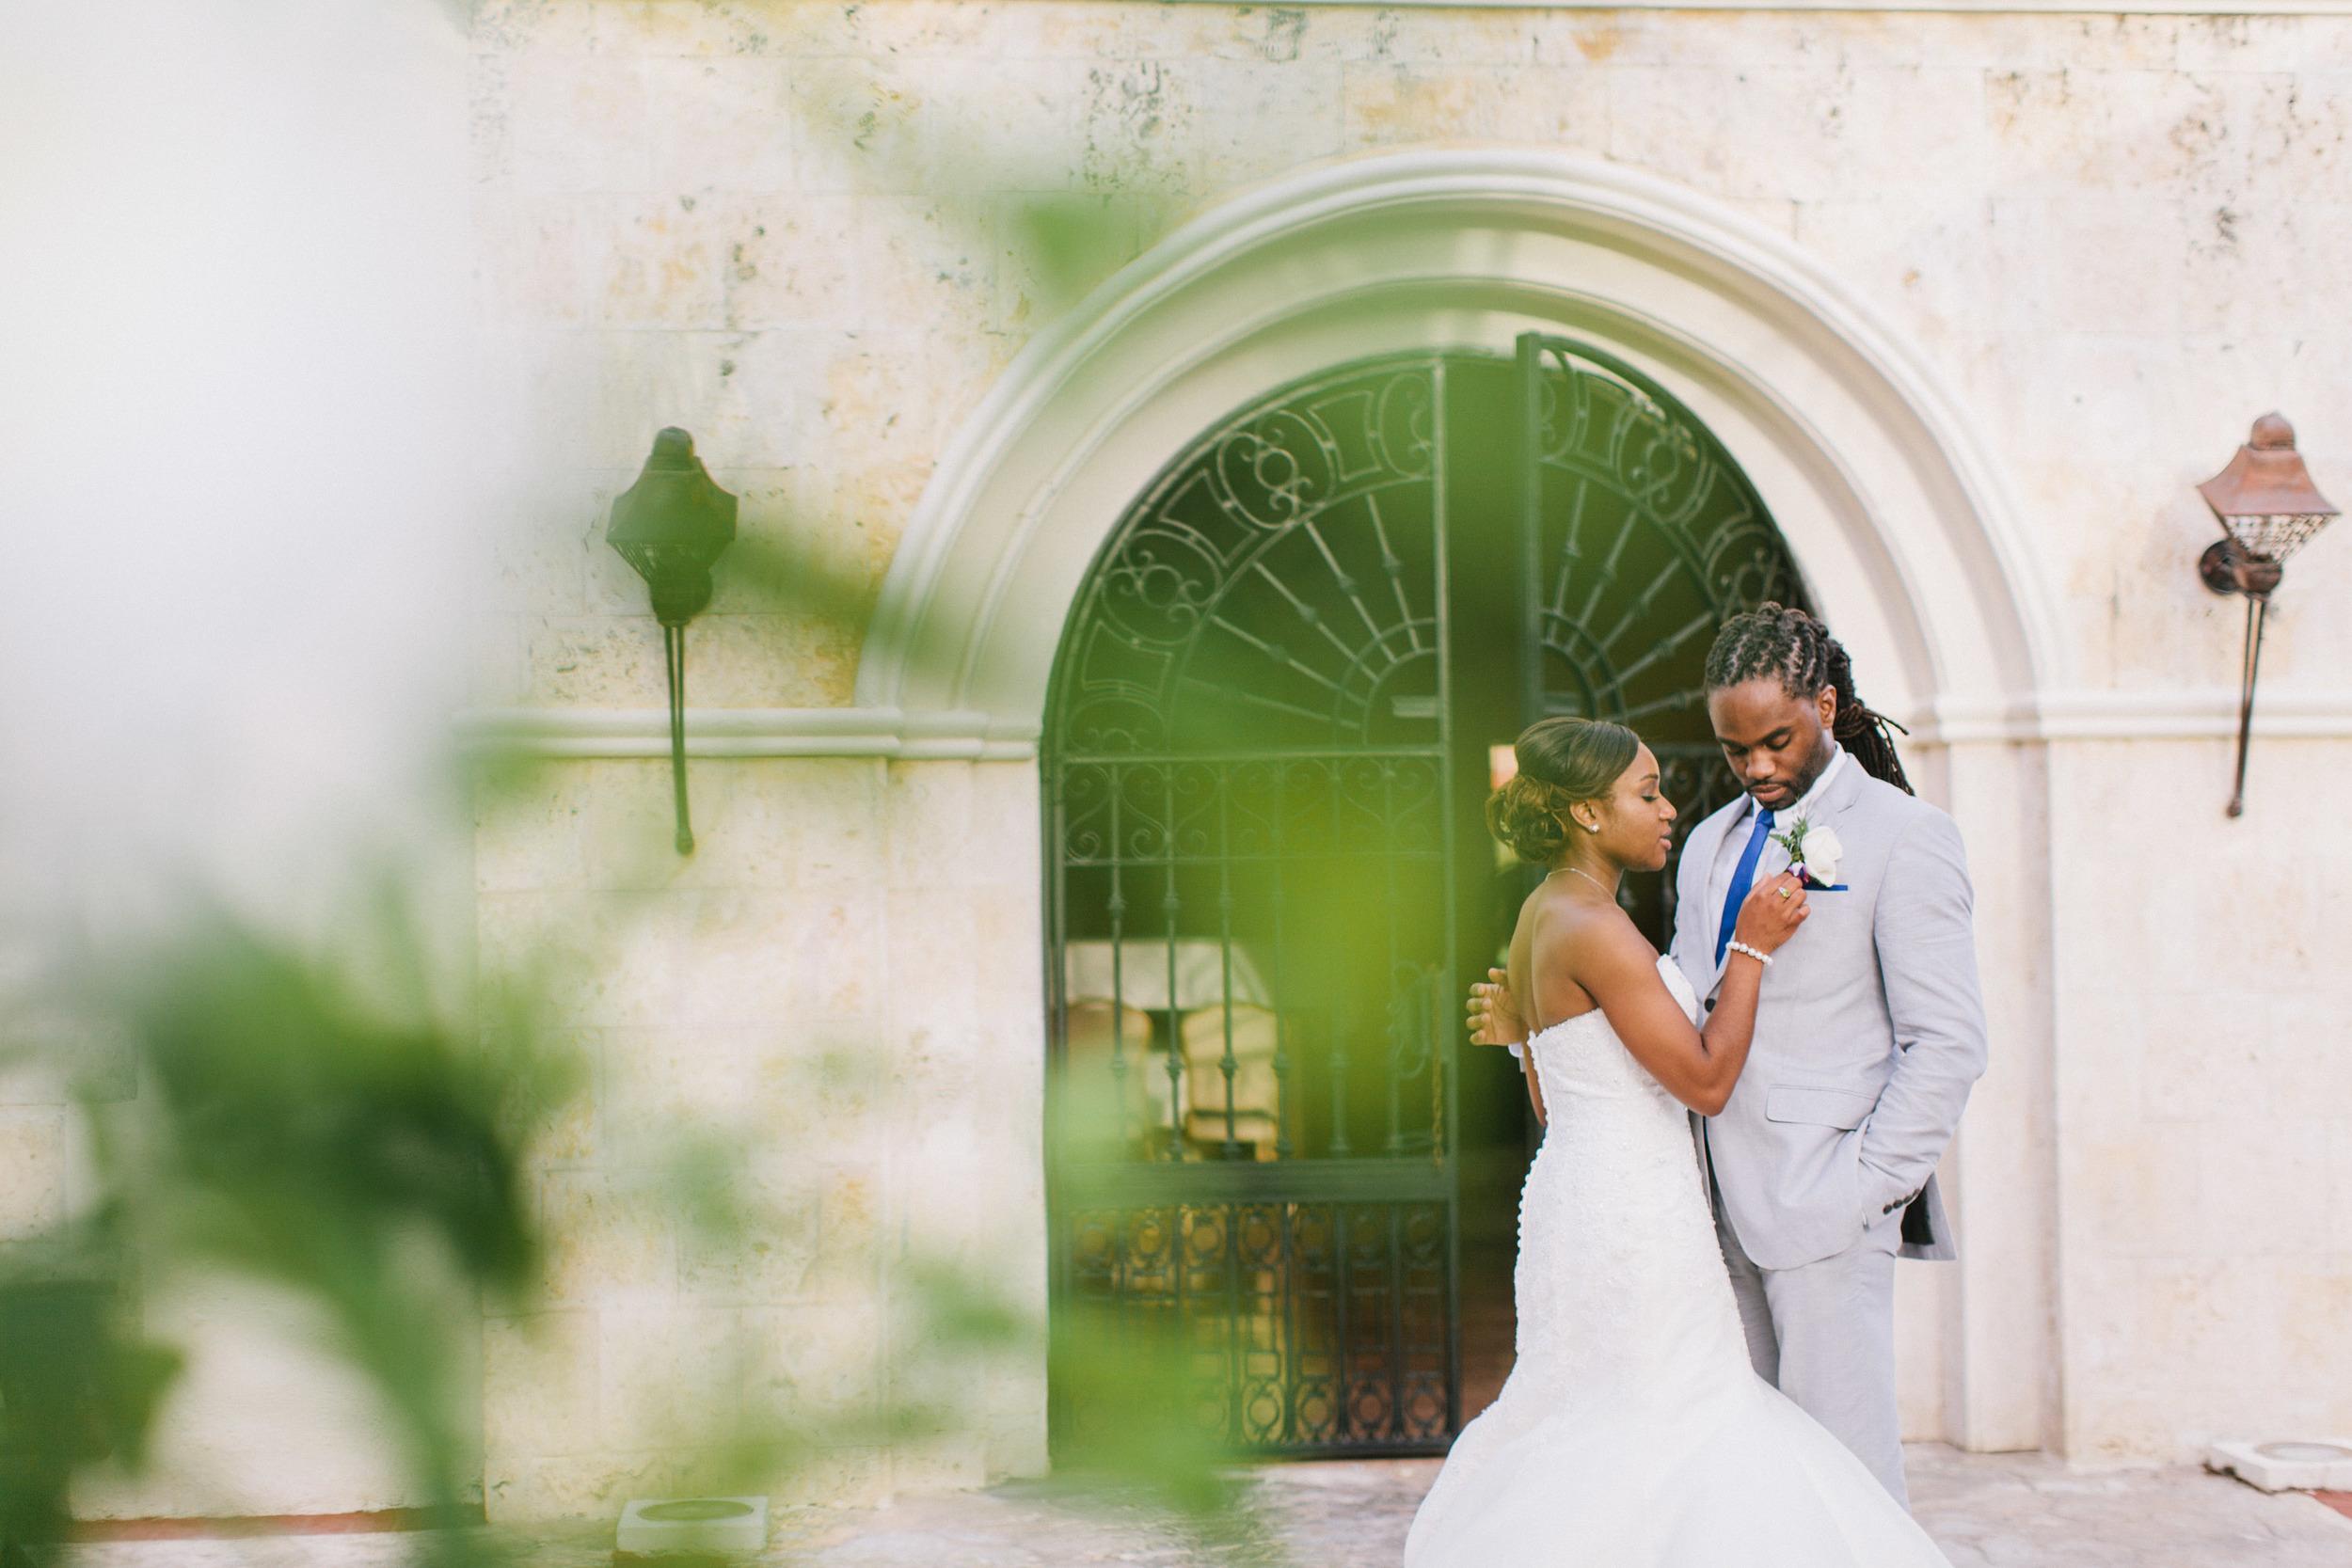 michael-rousseau-photography-dominican-republic-destination-wedding-cara-jason-colonial-majestic-dominican-republic109.jpg